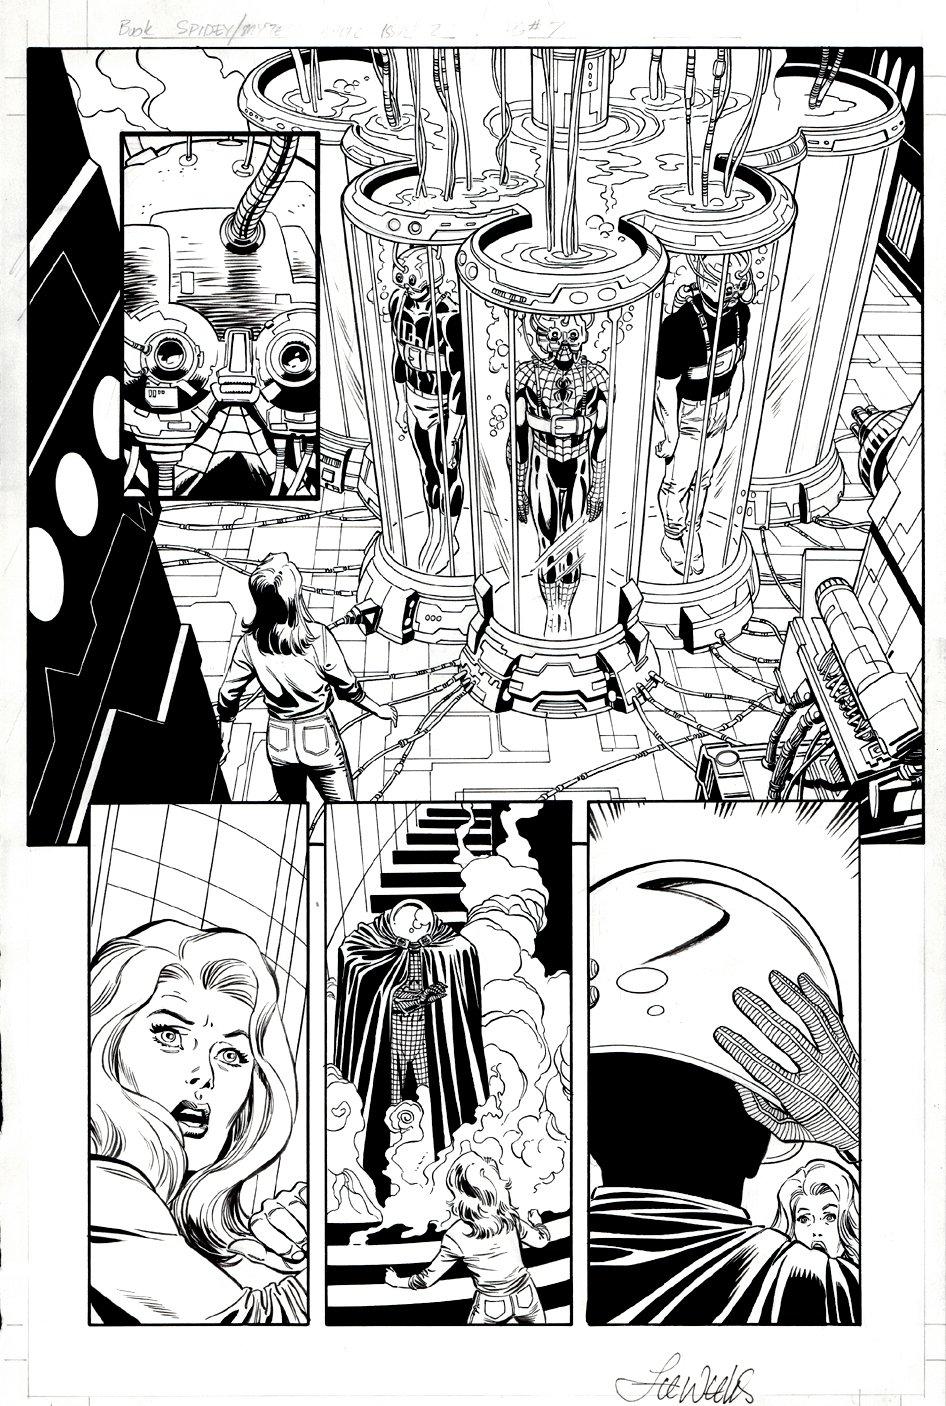 Spider-Man: The Mysterio Manifesto #3 p 7 Semi-Splash (Spider-Man, Daredevil, Mysterio!) 2000